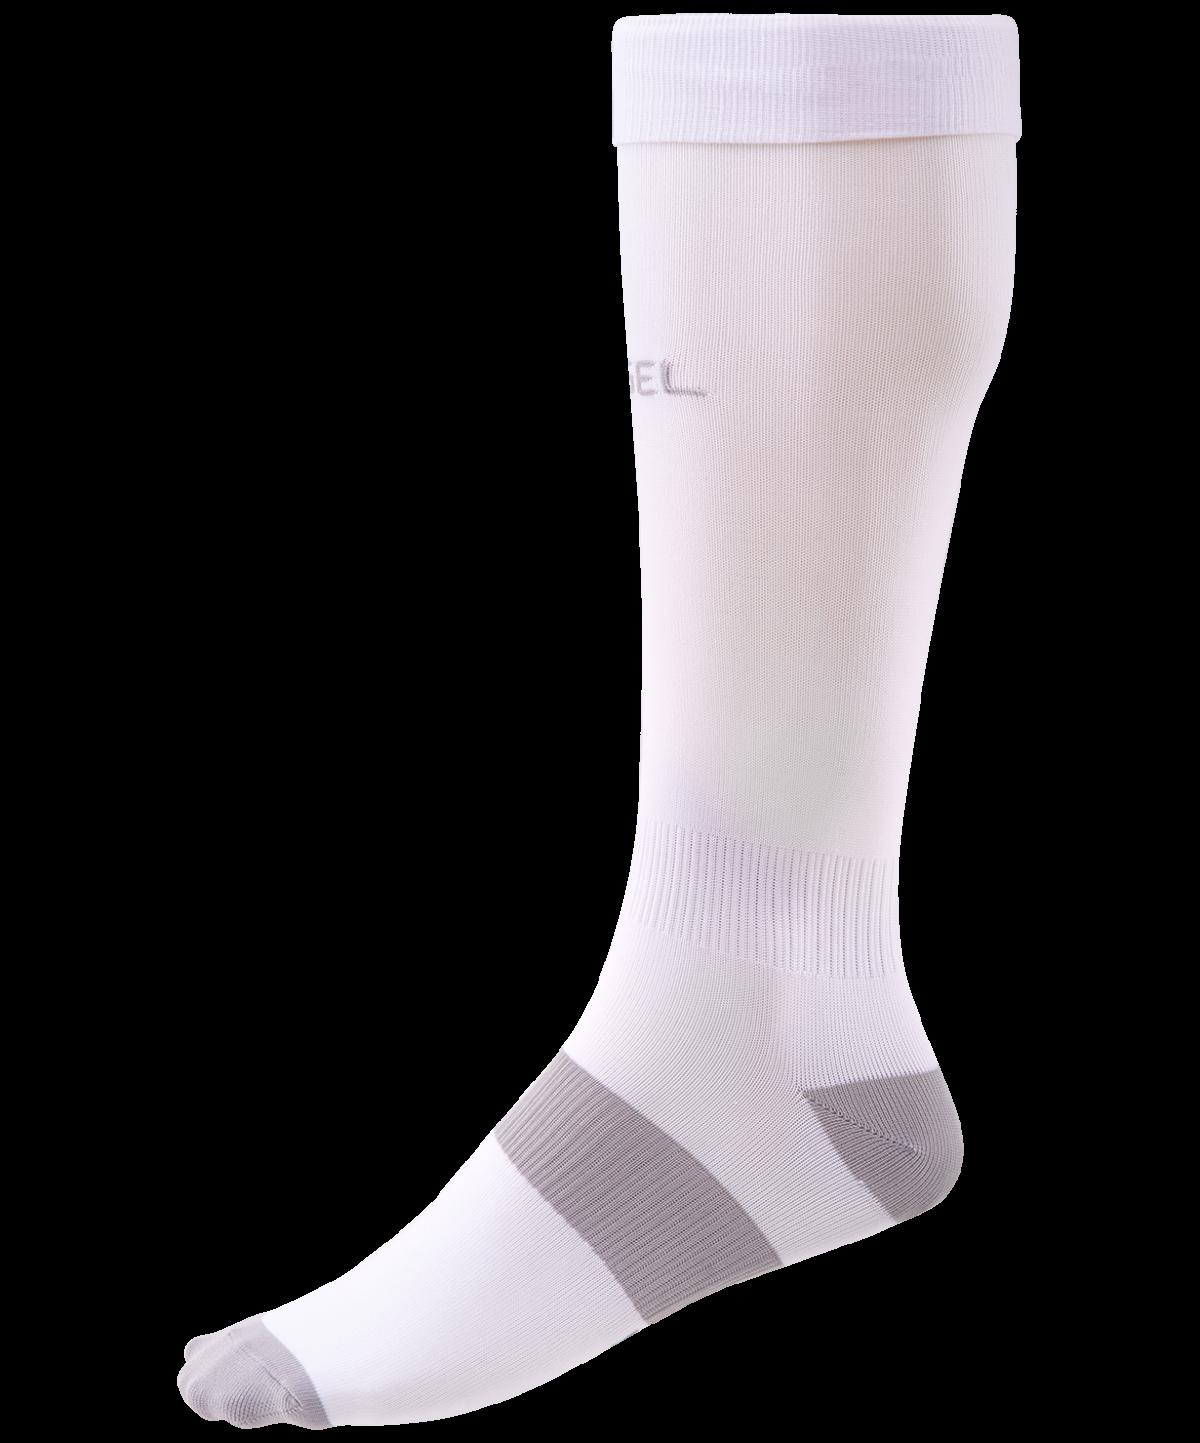 JOGEL Гетры футбольные Essentiаl, белый/серый  JA-006 - 1